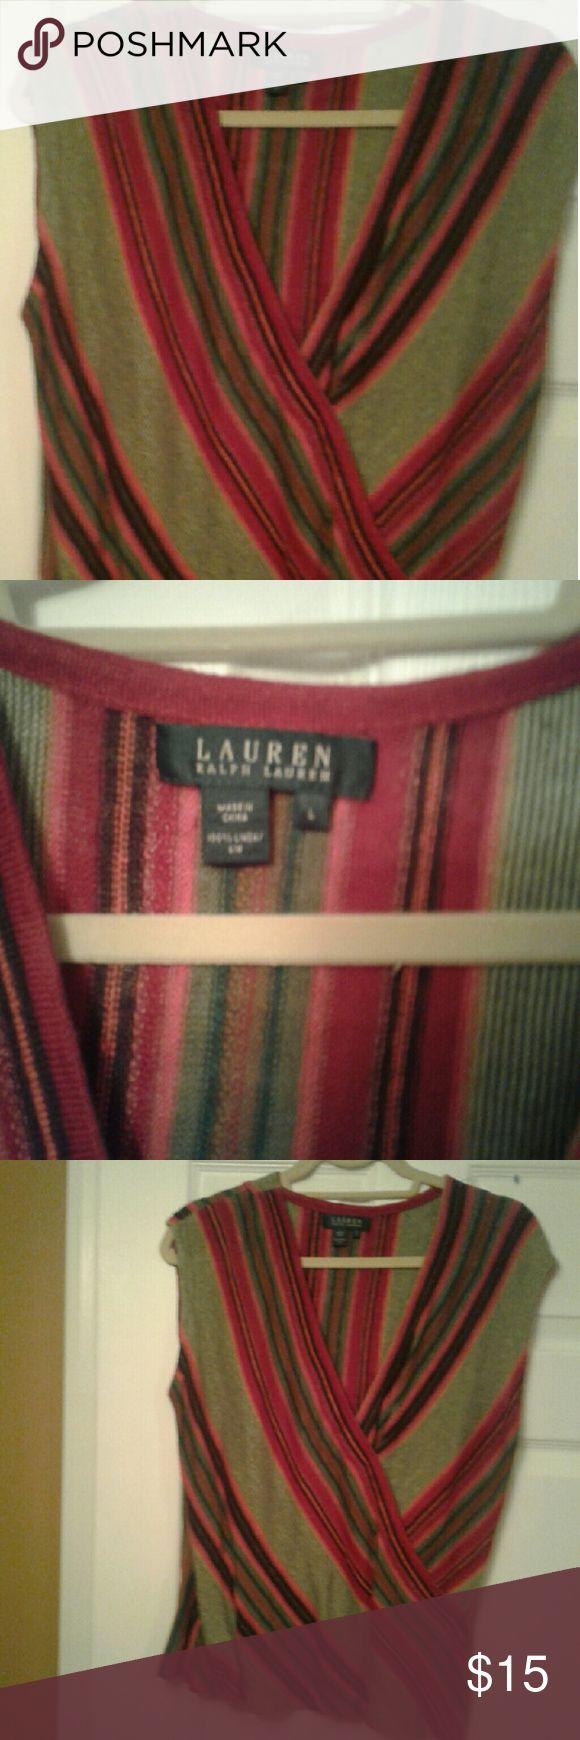 NWOT  Ralph Lauren  Sleeveless Sweater Multi color Ralph Laurn sweater. Very versatile.  Never worn Ralph Lauren  Sweaters